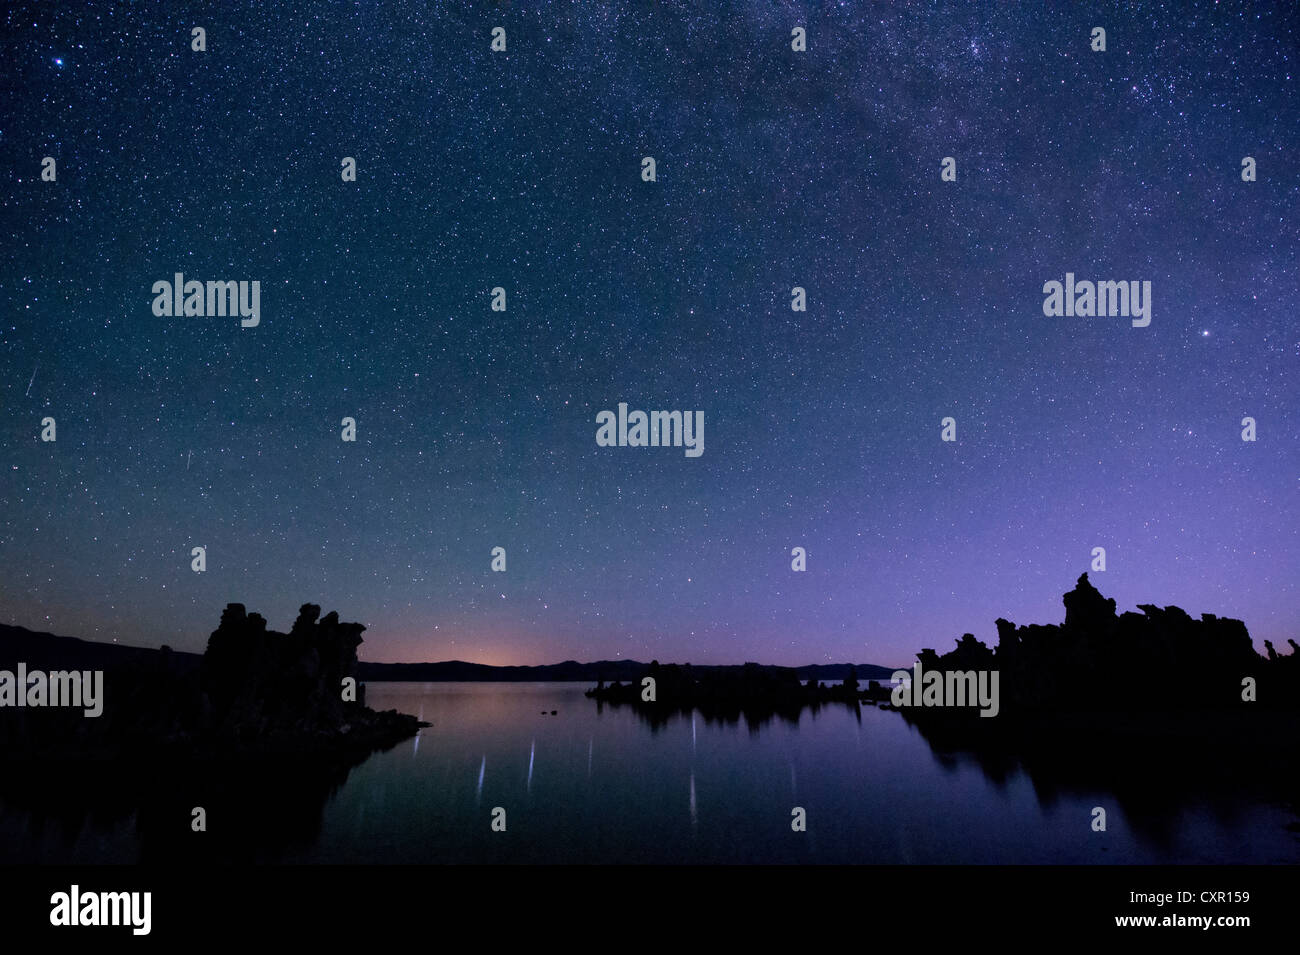 Starry sky at night, mono lake, california, usa - Stock Image